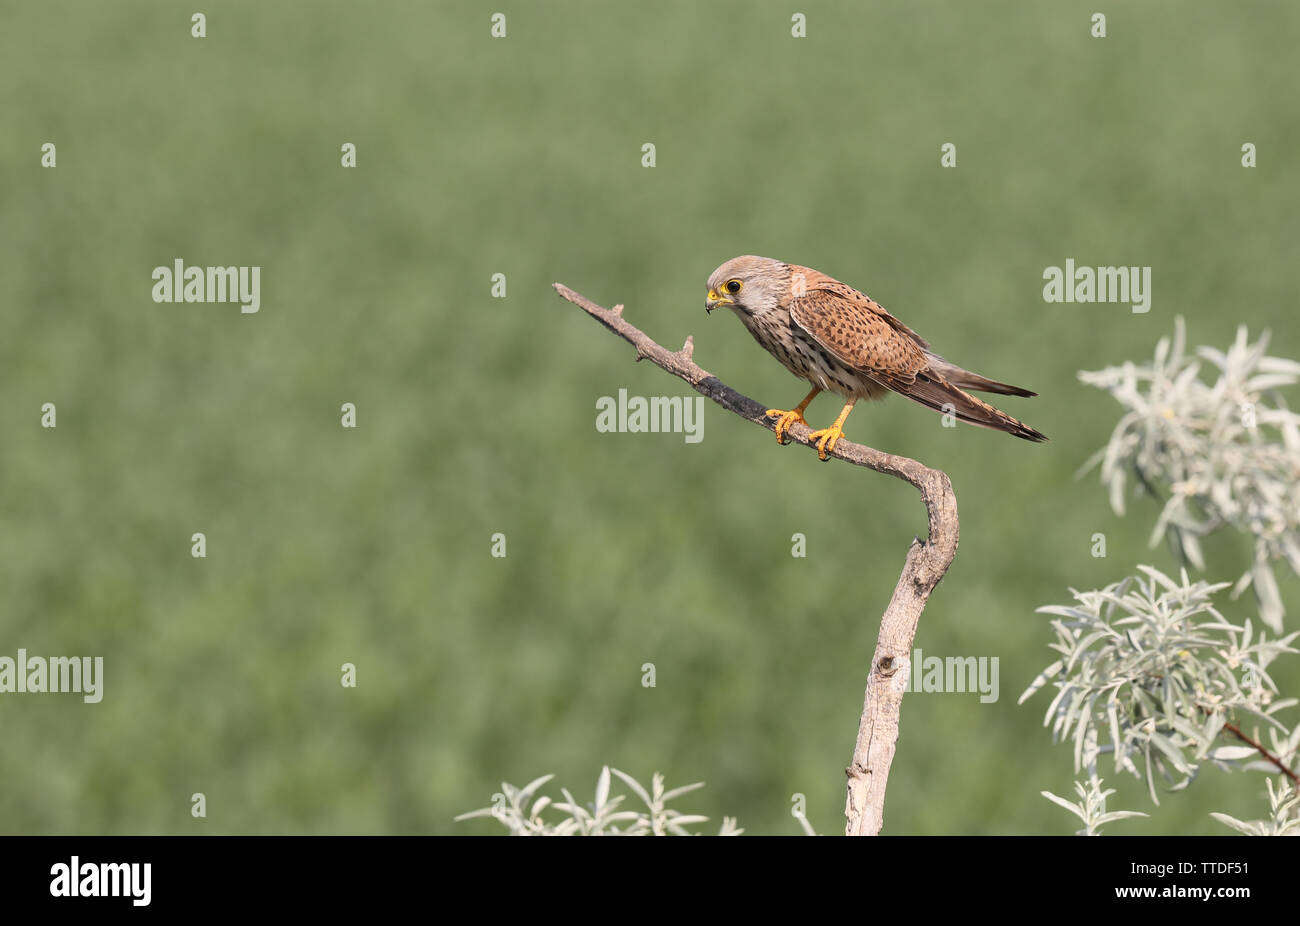 Common Kestrel (Falco tinnunculus